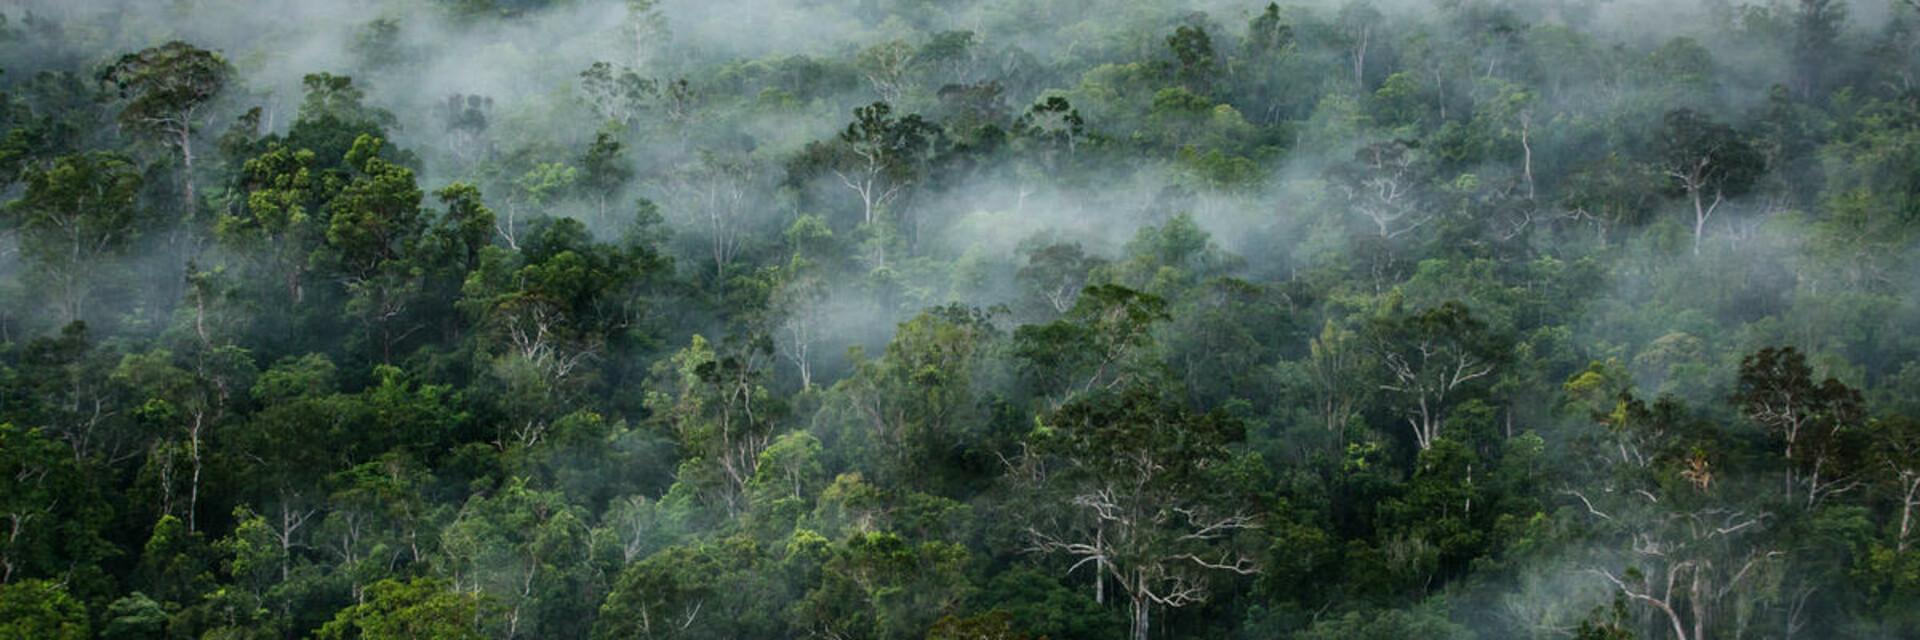 Greenpeace | Ulet Ifansasti